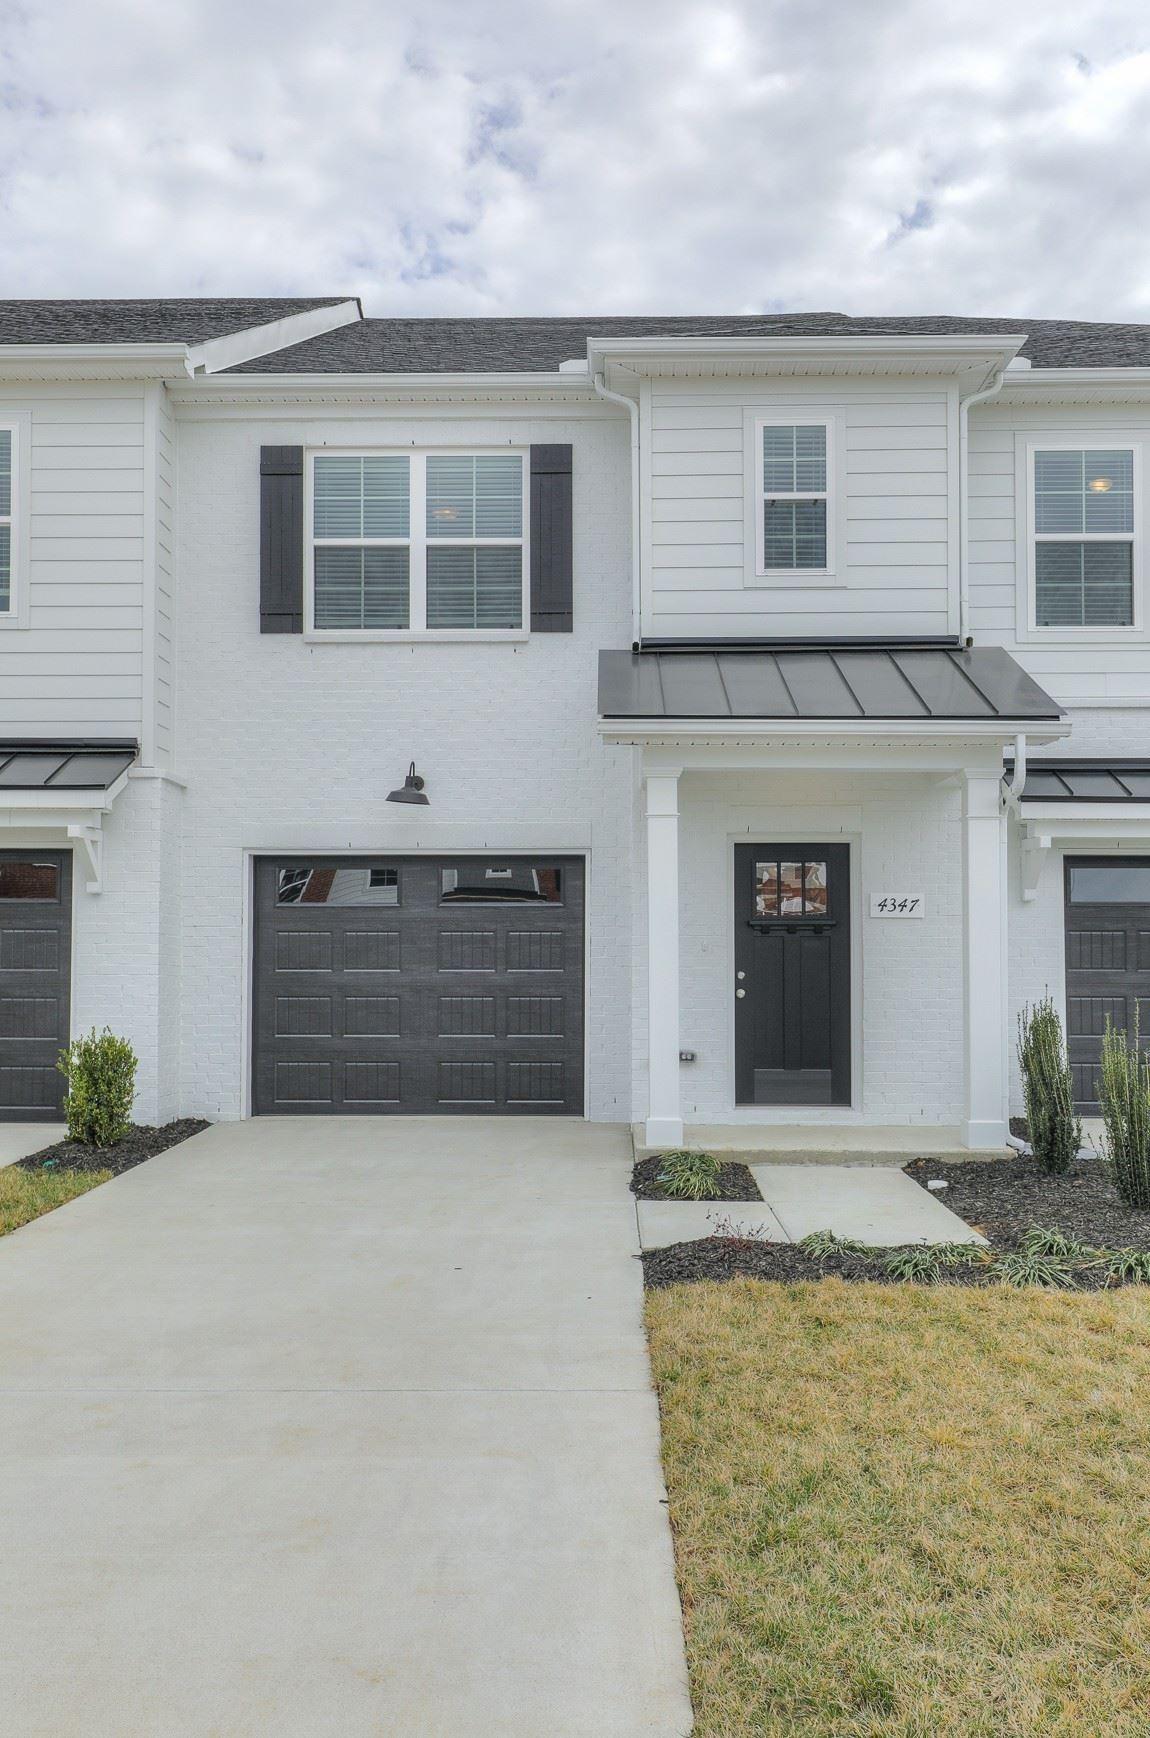 Photo of 4208 Spyglass Drive, Murfreesboro, TN 37127 (MLS # 2252091)